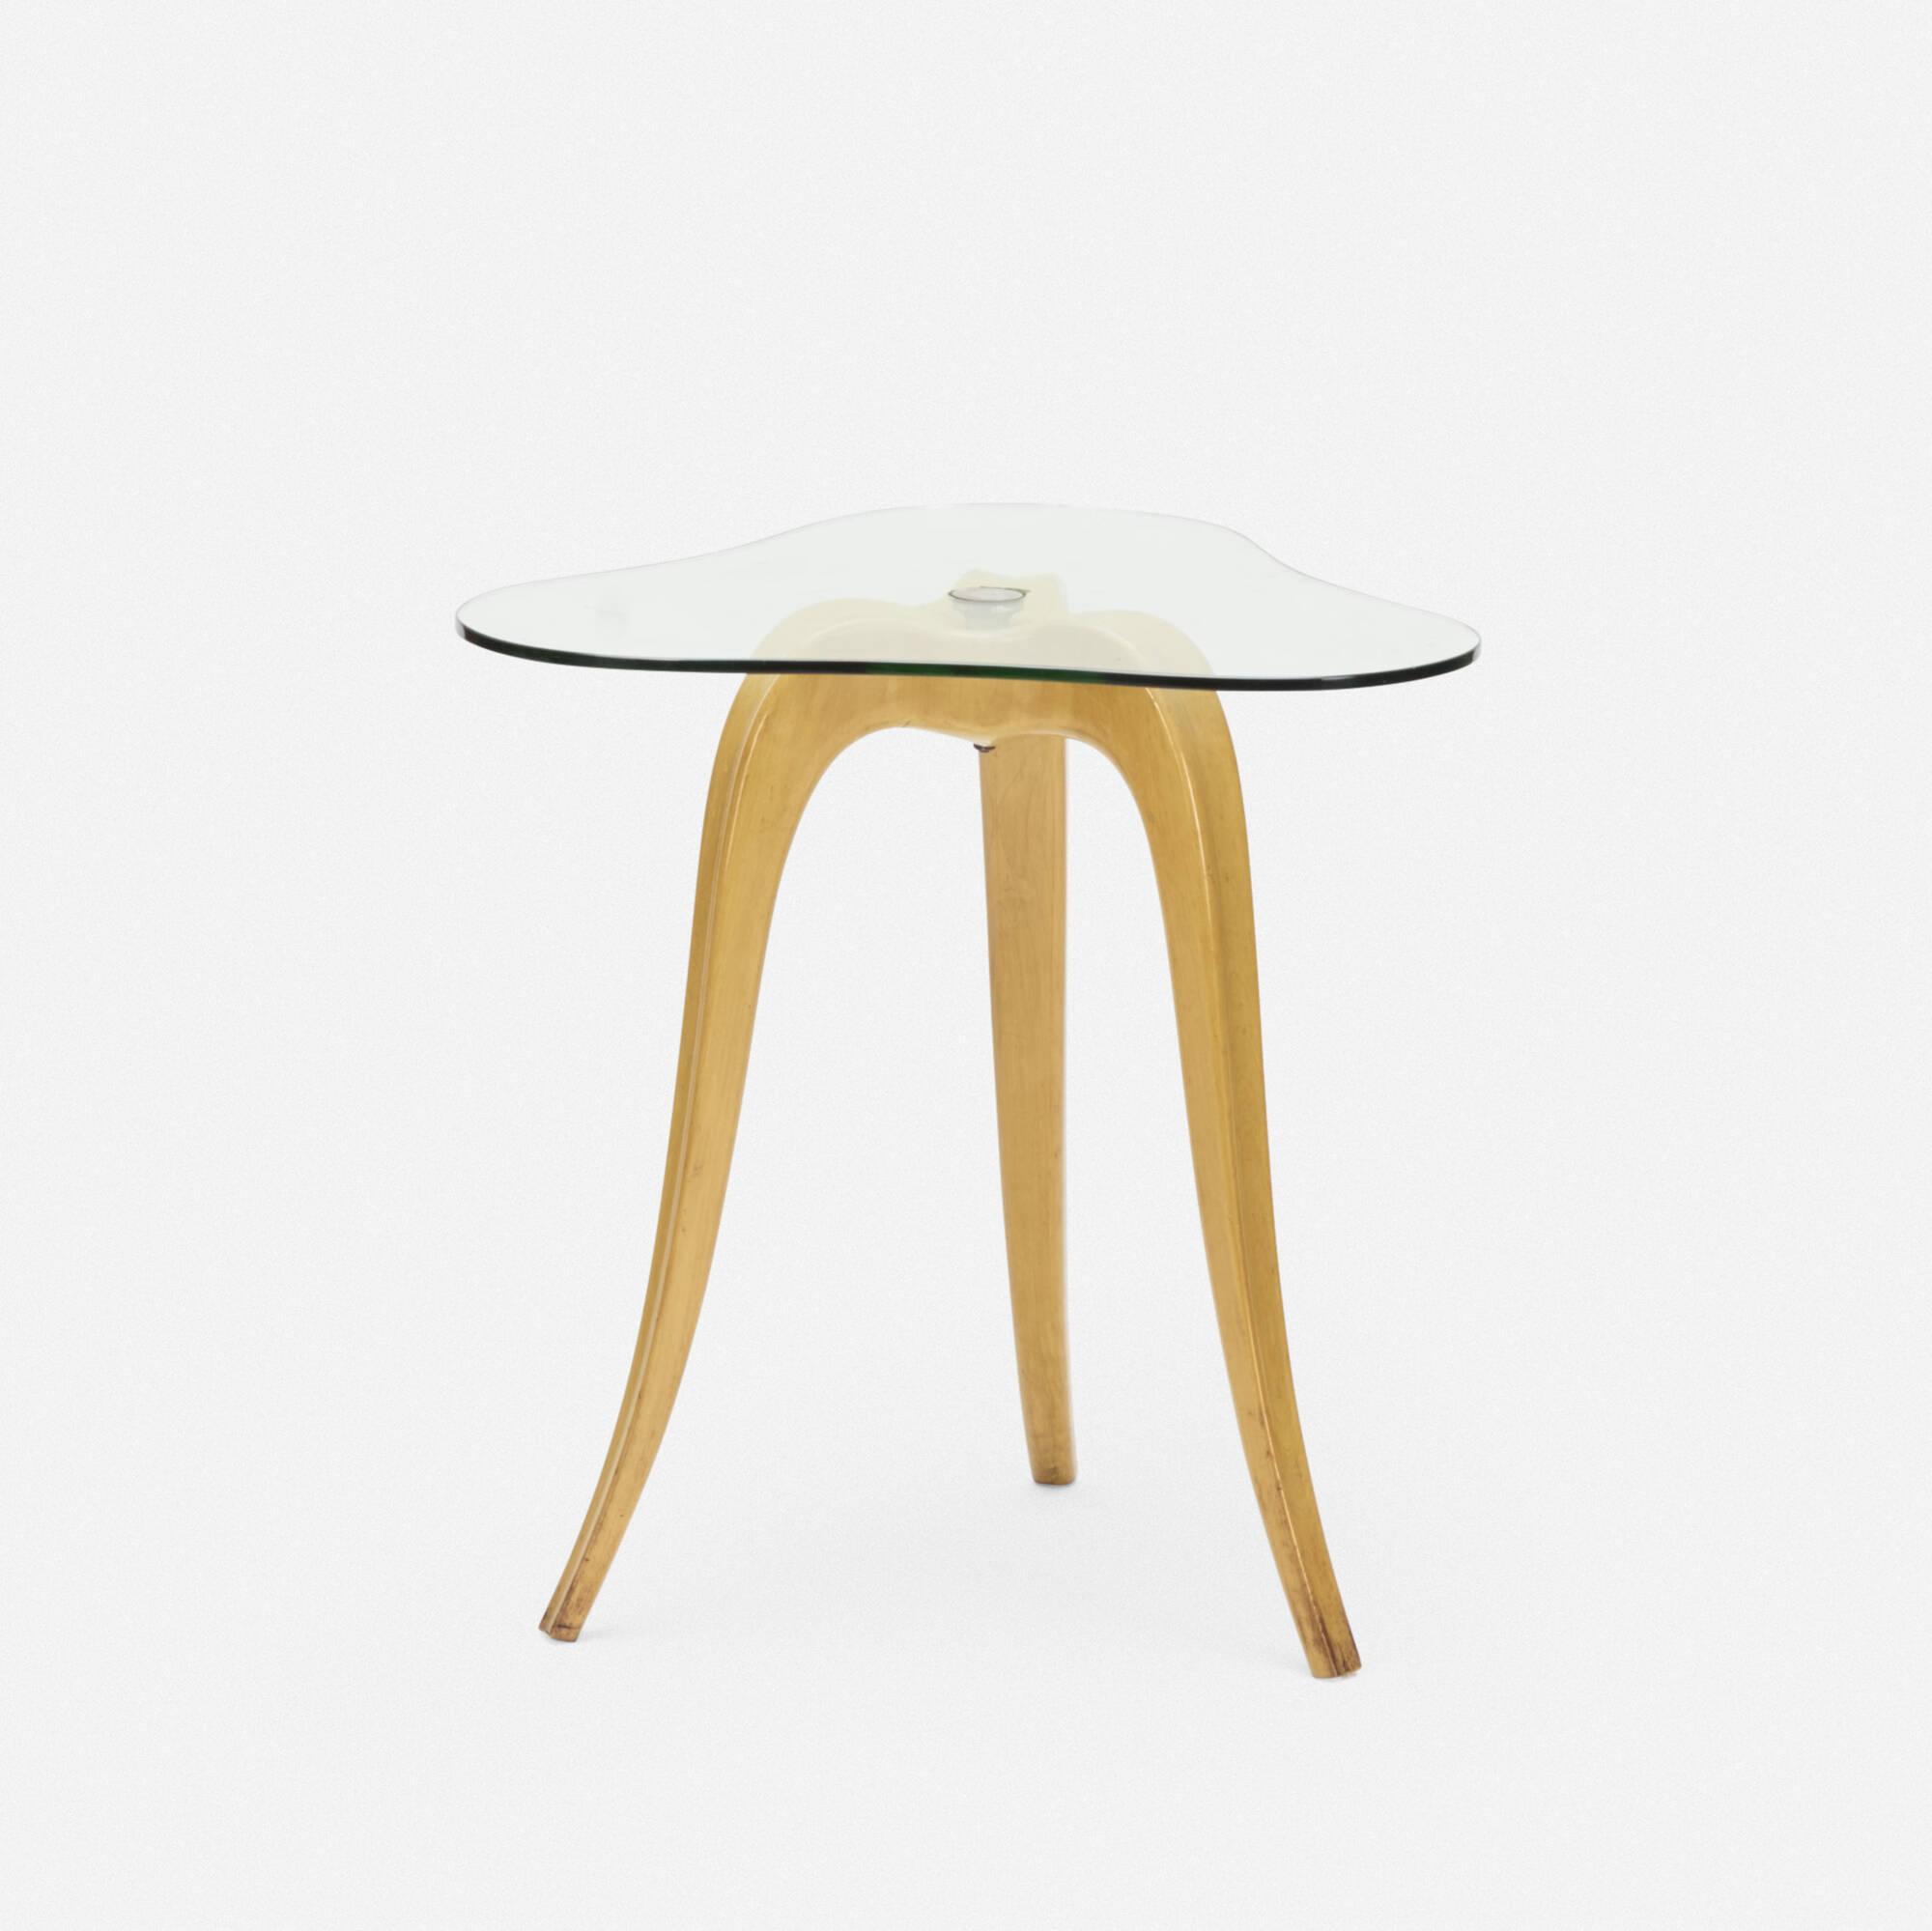 124: Osvaldo Borsani / occasional table (1 of 2)